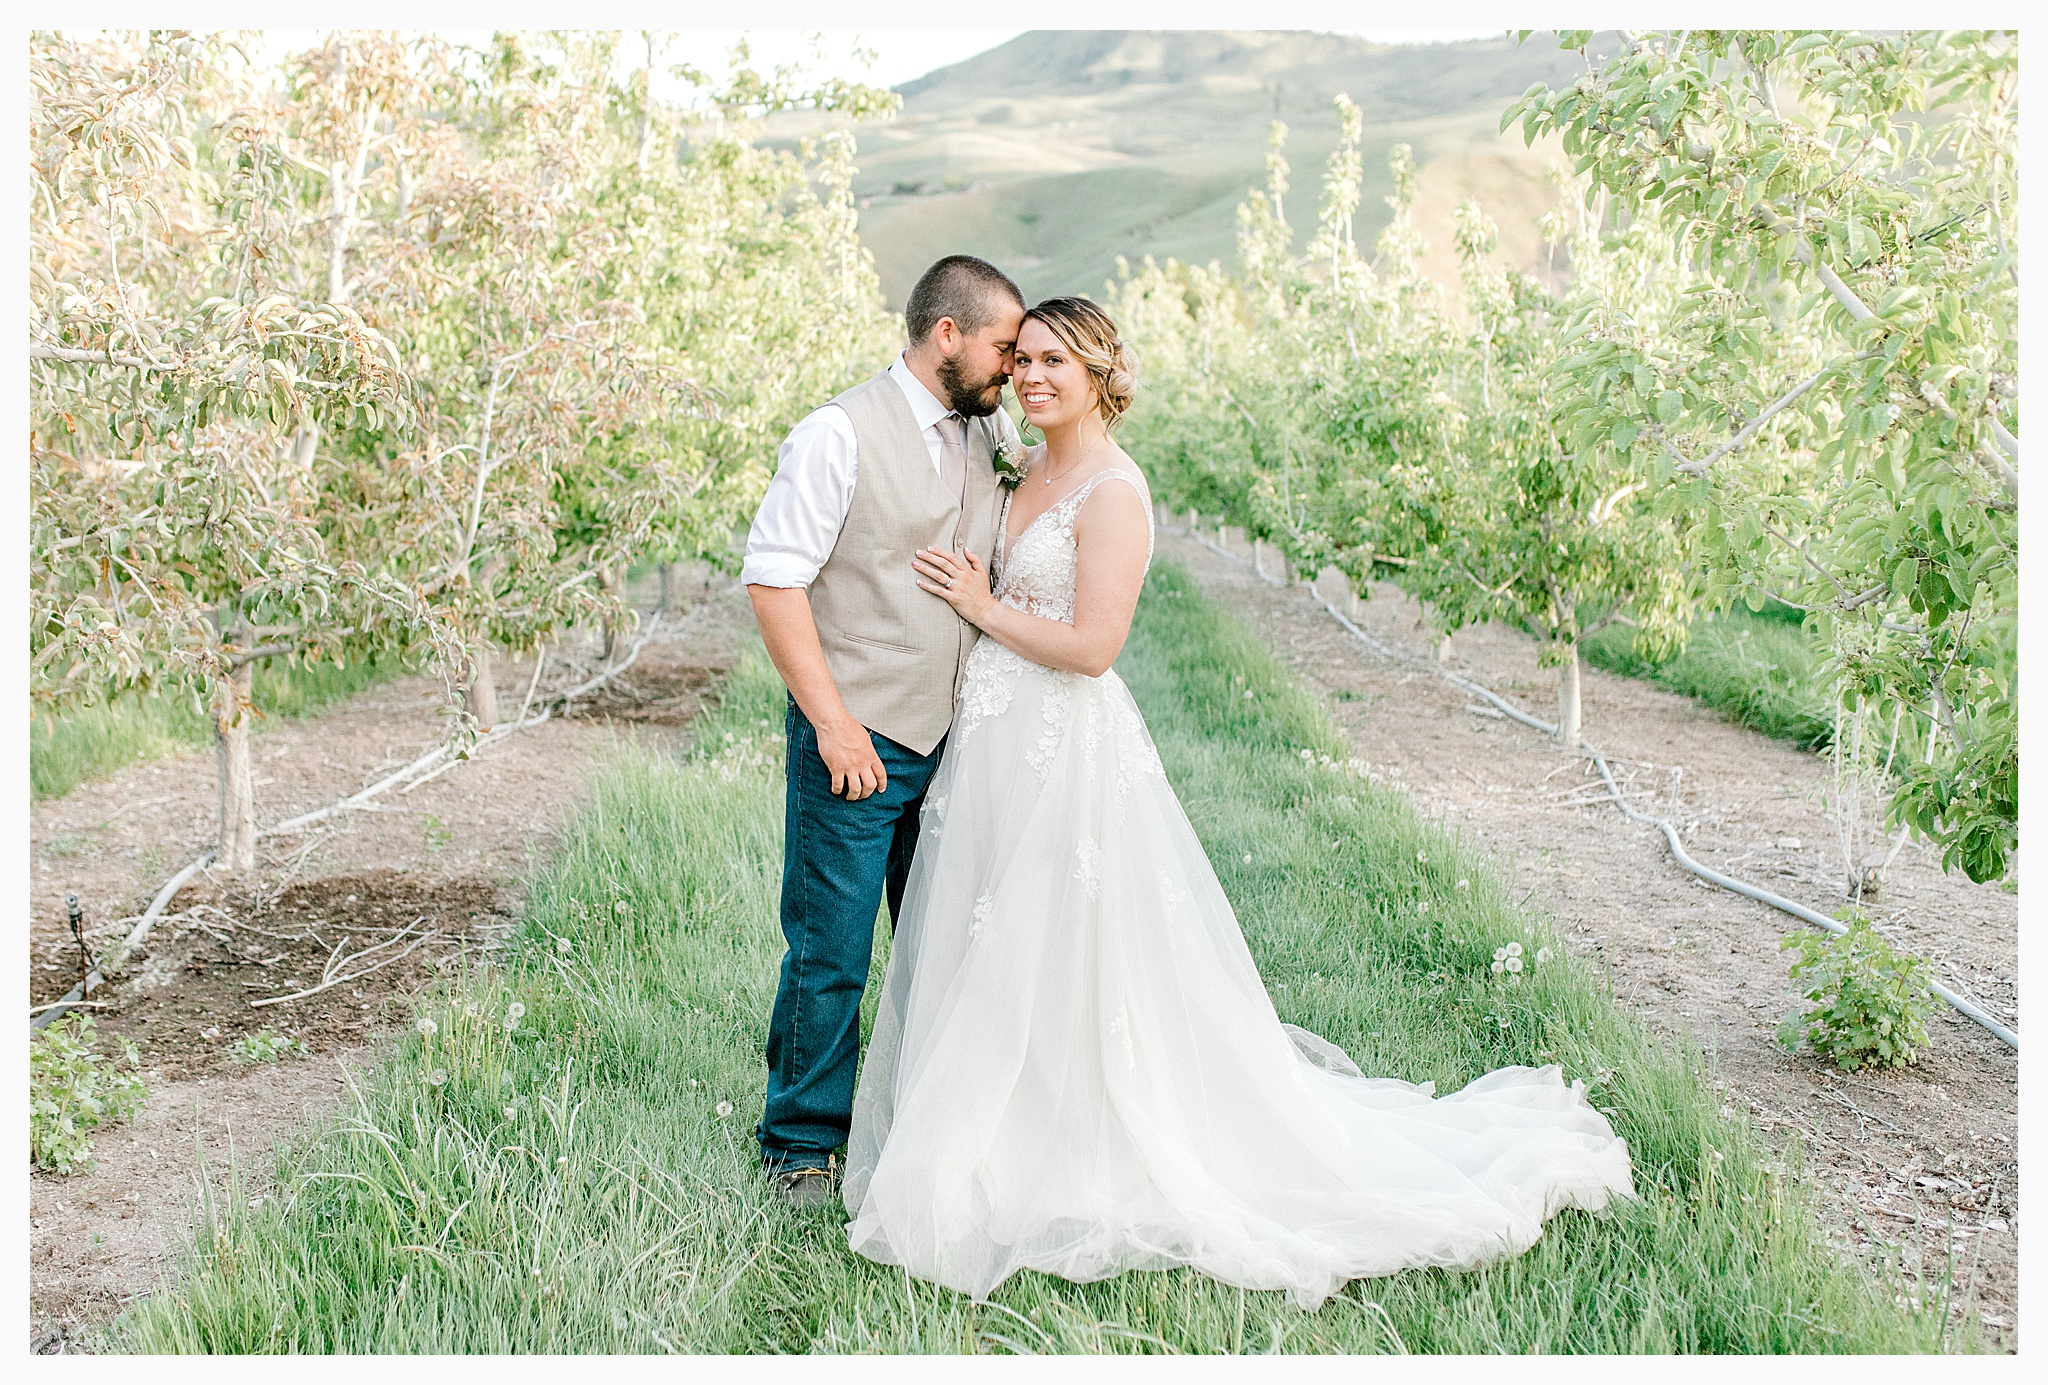 Rustic barn wedding in Wenatchee Washington at Sunshine Ranch on Easy Street, Emma Rose Company Seattle PNW Light and Airy Wedding Photographer_0132.jpg